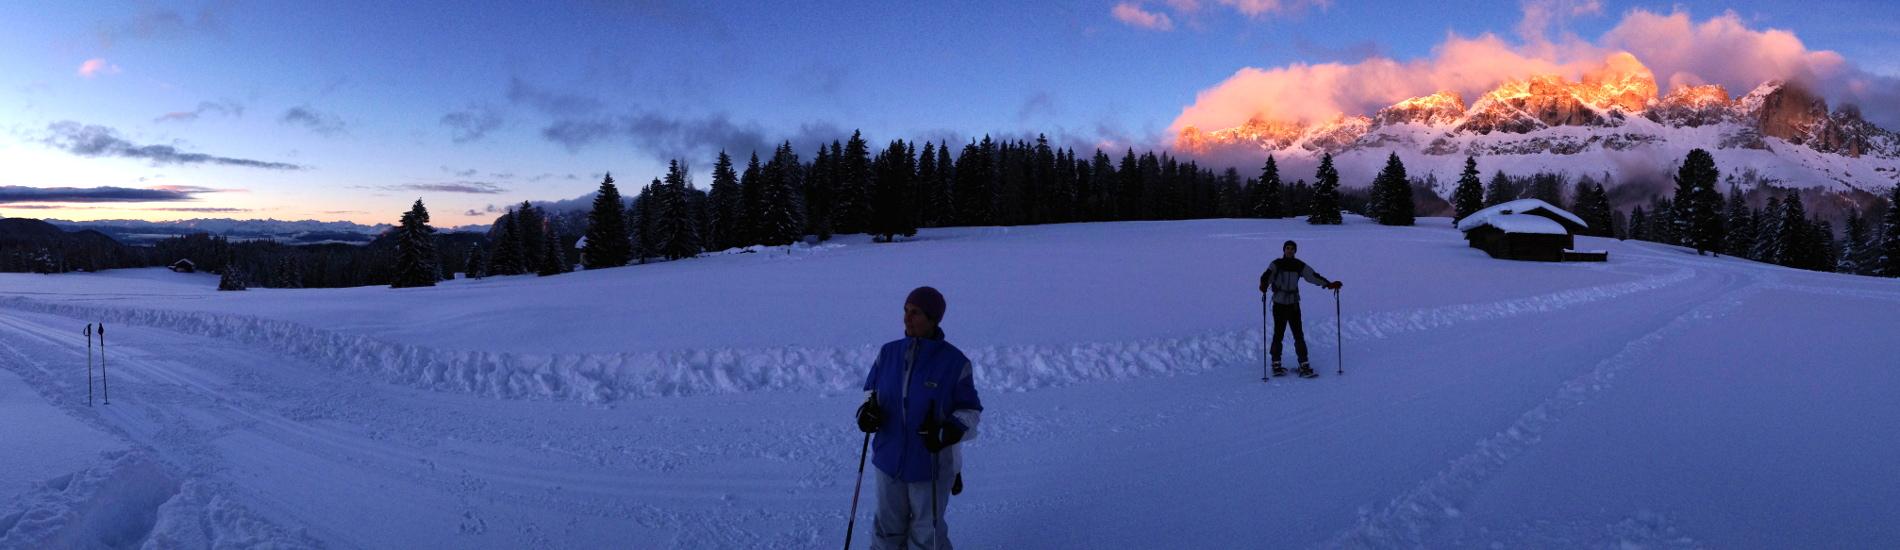 Ciaspolate sulle Dolomiti